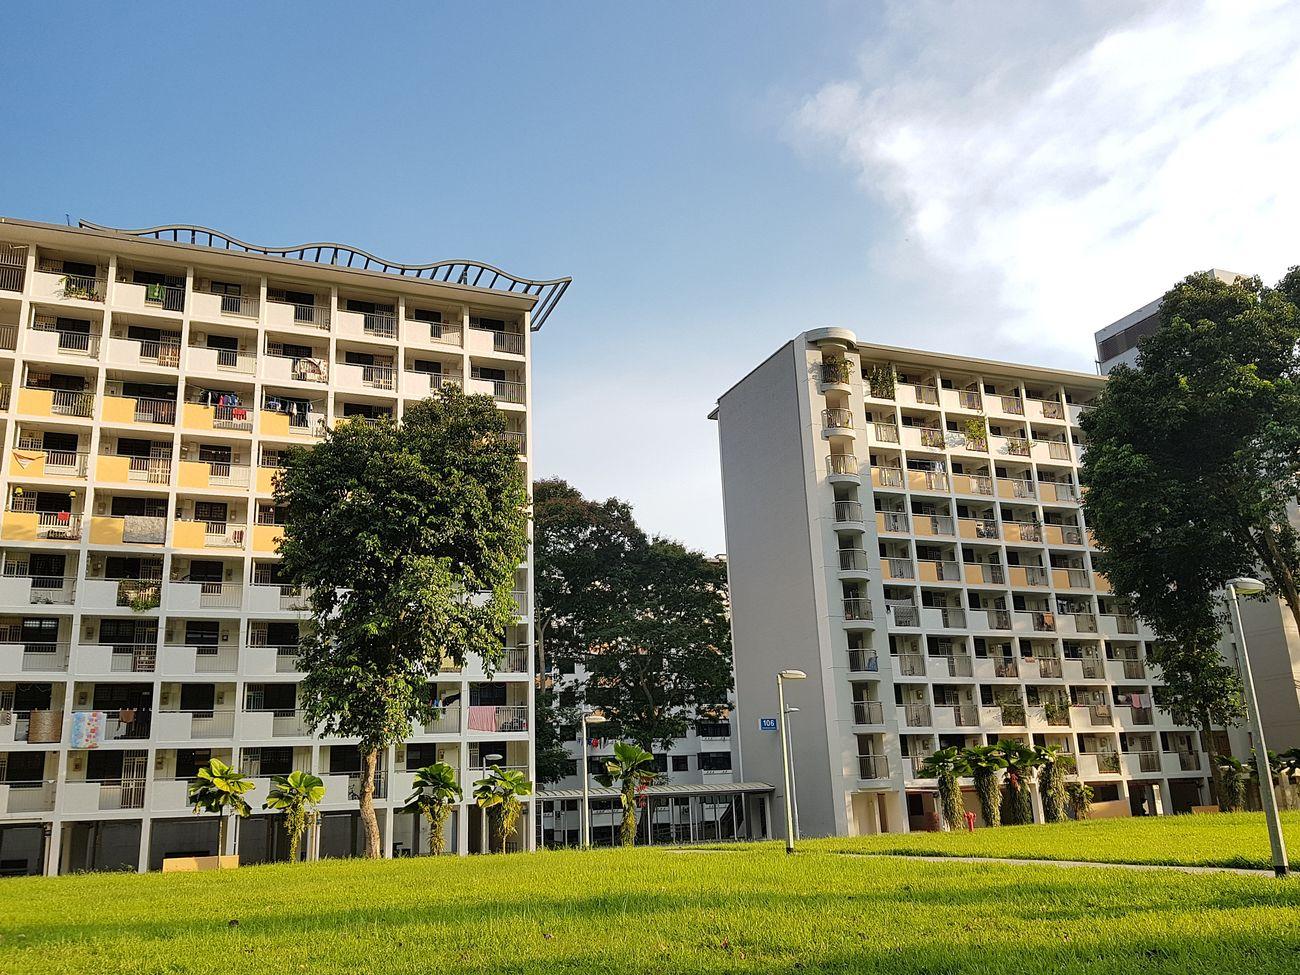 Flats Architecture Sg_architecture Commonwealth Singapore